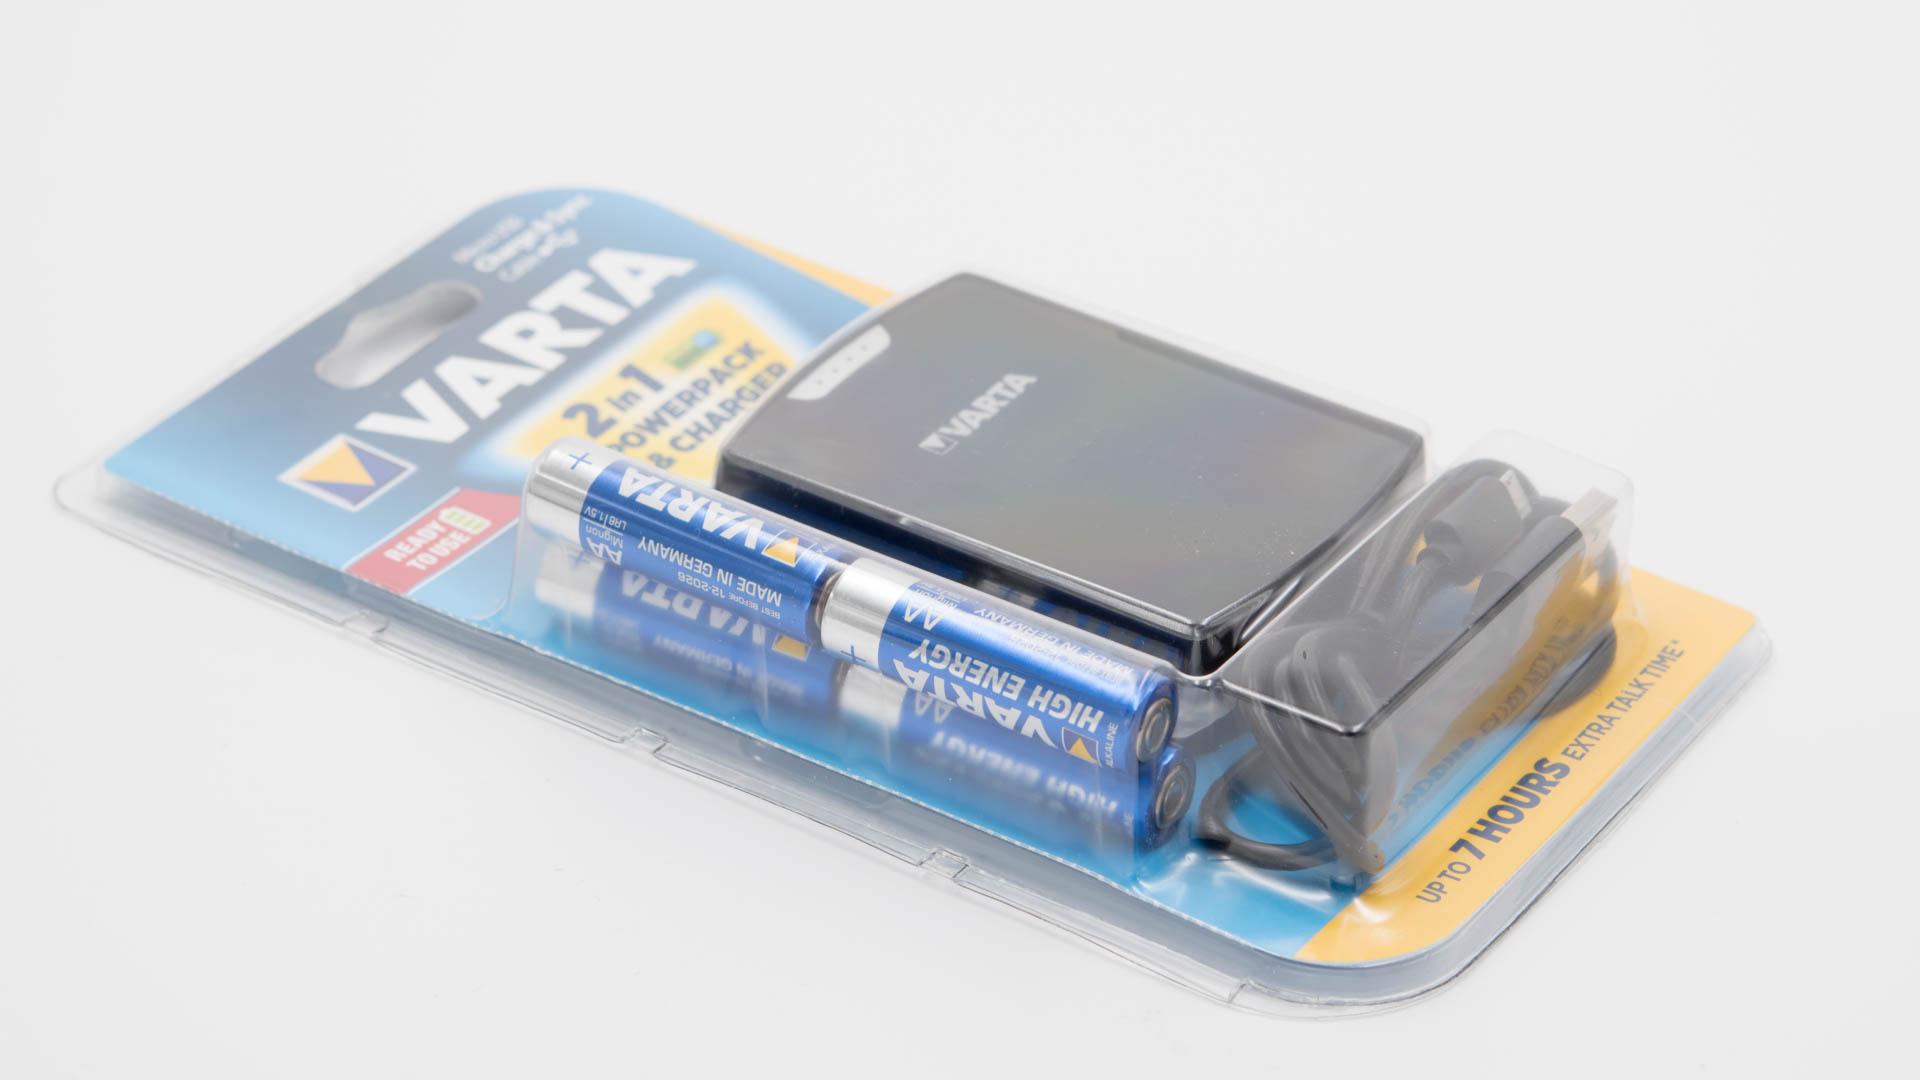 das varta 2 in 1 powerpack charger im test sein smartphone mit aa batterien laden techtest. Black Bedroom Furniture Sets. Home Design Ideas